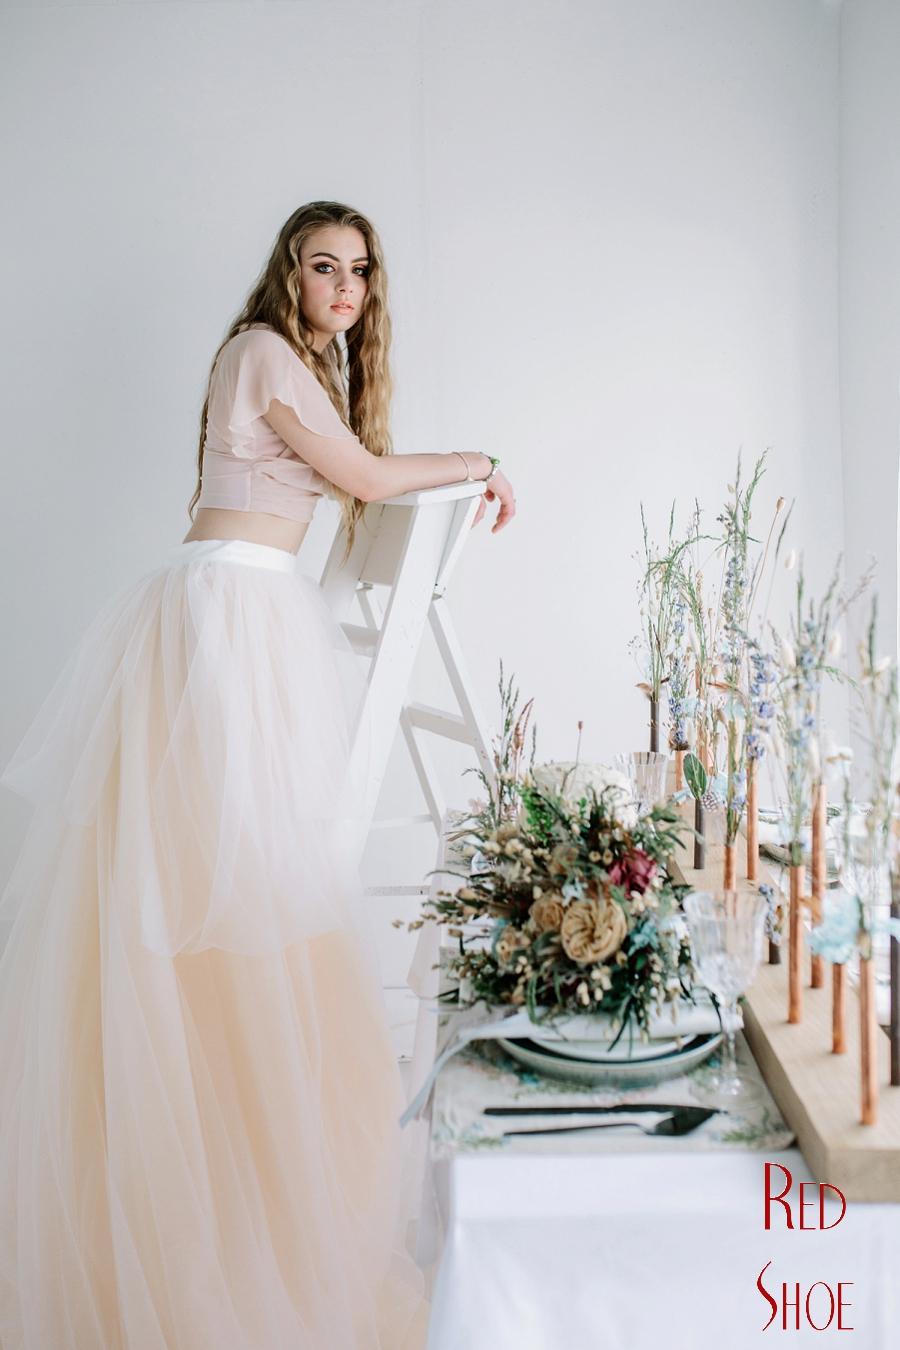 Boho bride, Glam Boho bride, Wedding inspiration, Styled wedding photo shoot, wedding ideas, wedding flower ideas, wedding photography, dried wedding flowers, boho bride makeup ideas_0061.jpg